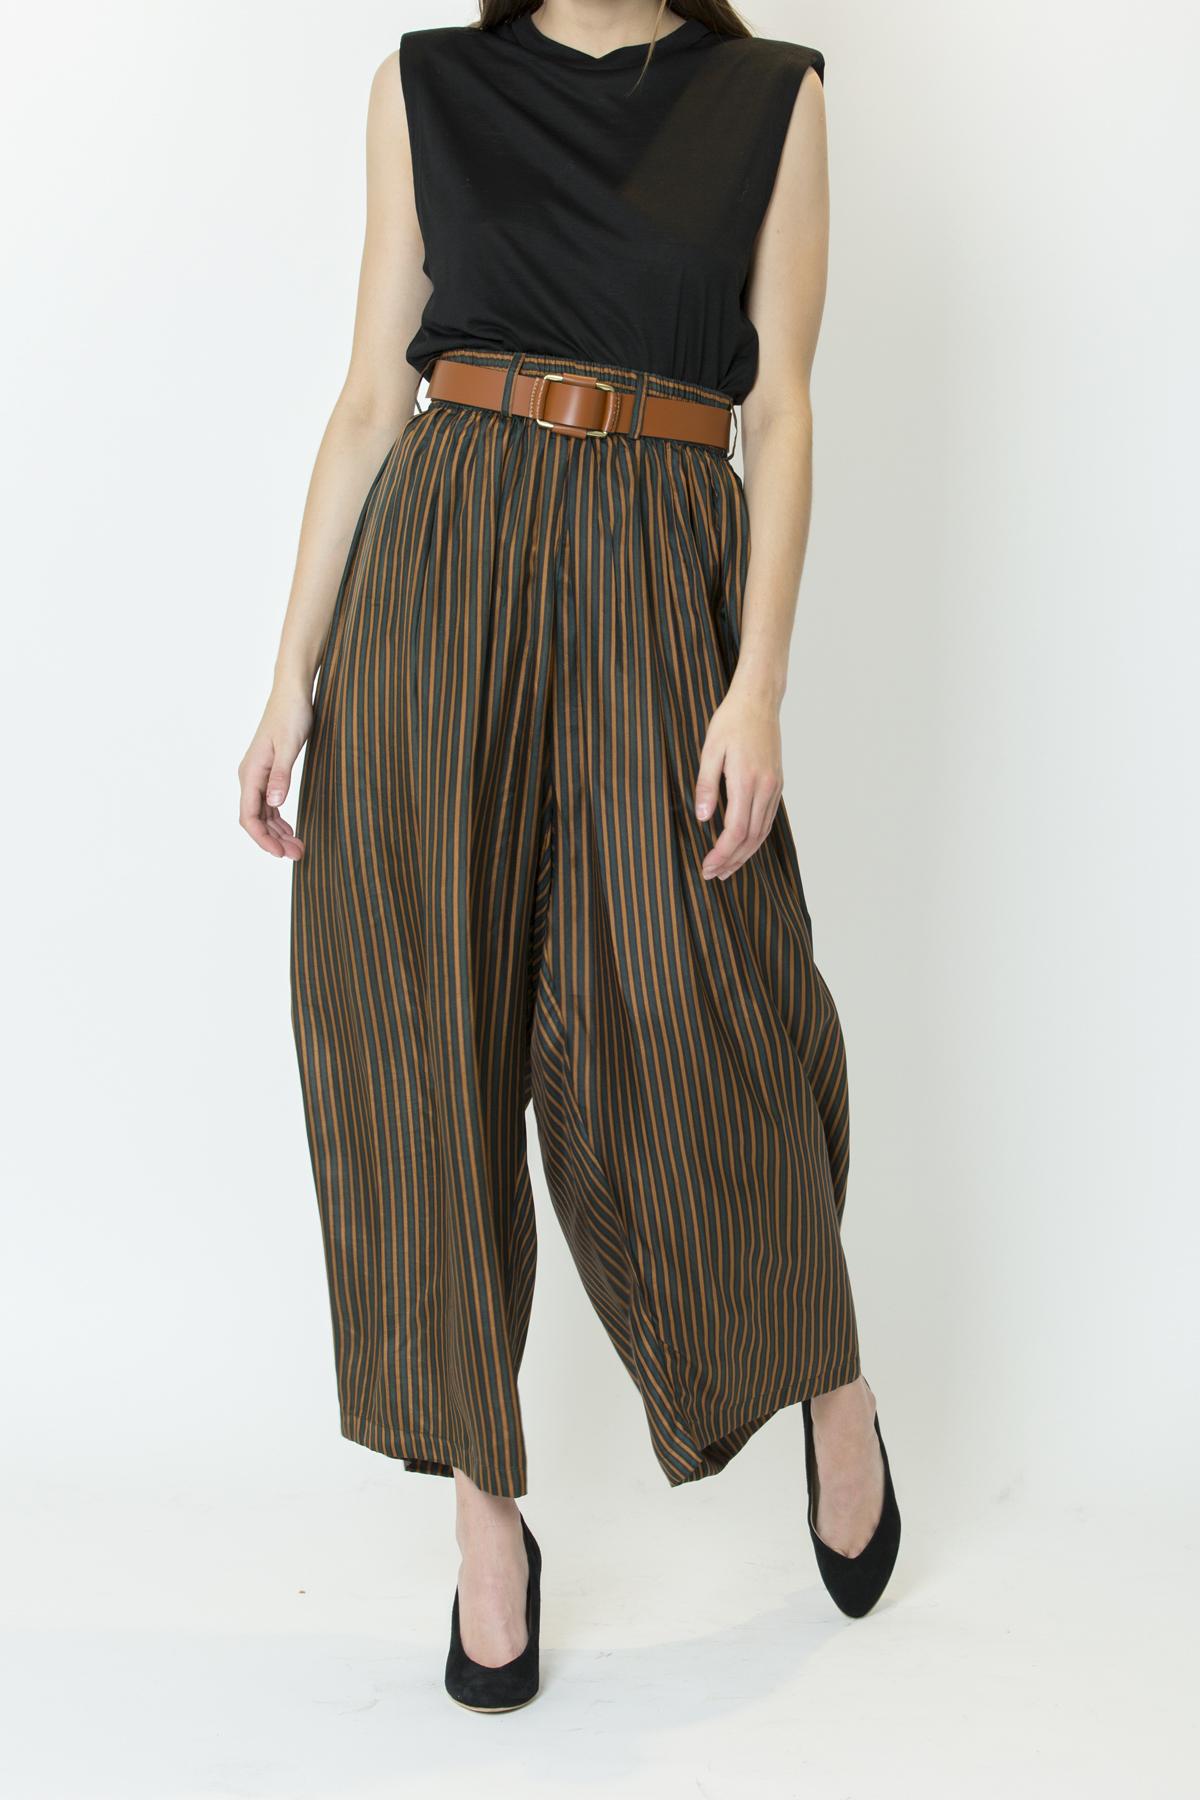 mesdemoiselles-matchboxathens-silk-stripes-volume-pants-green